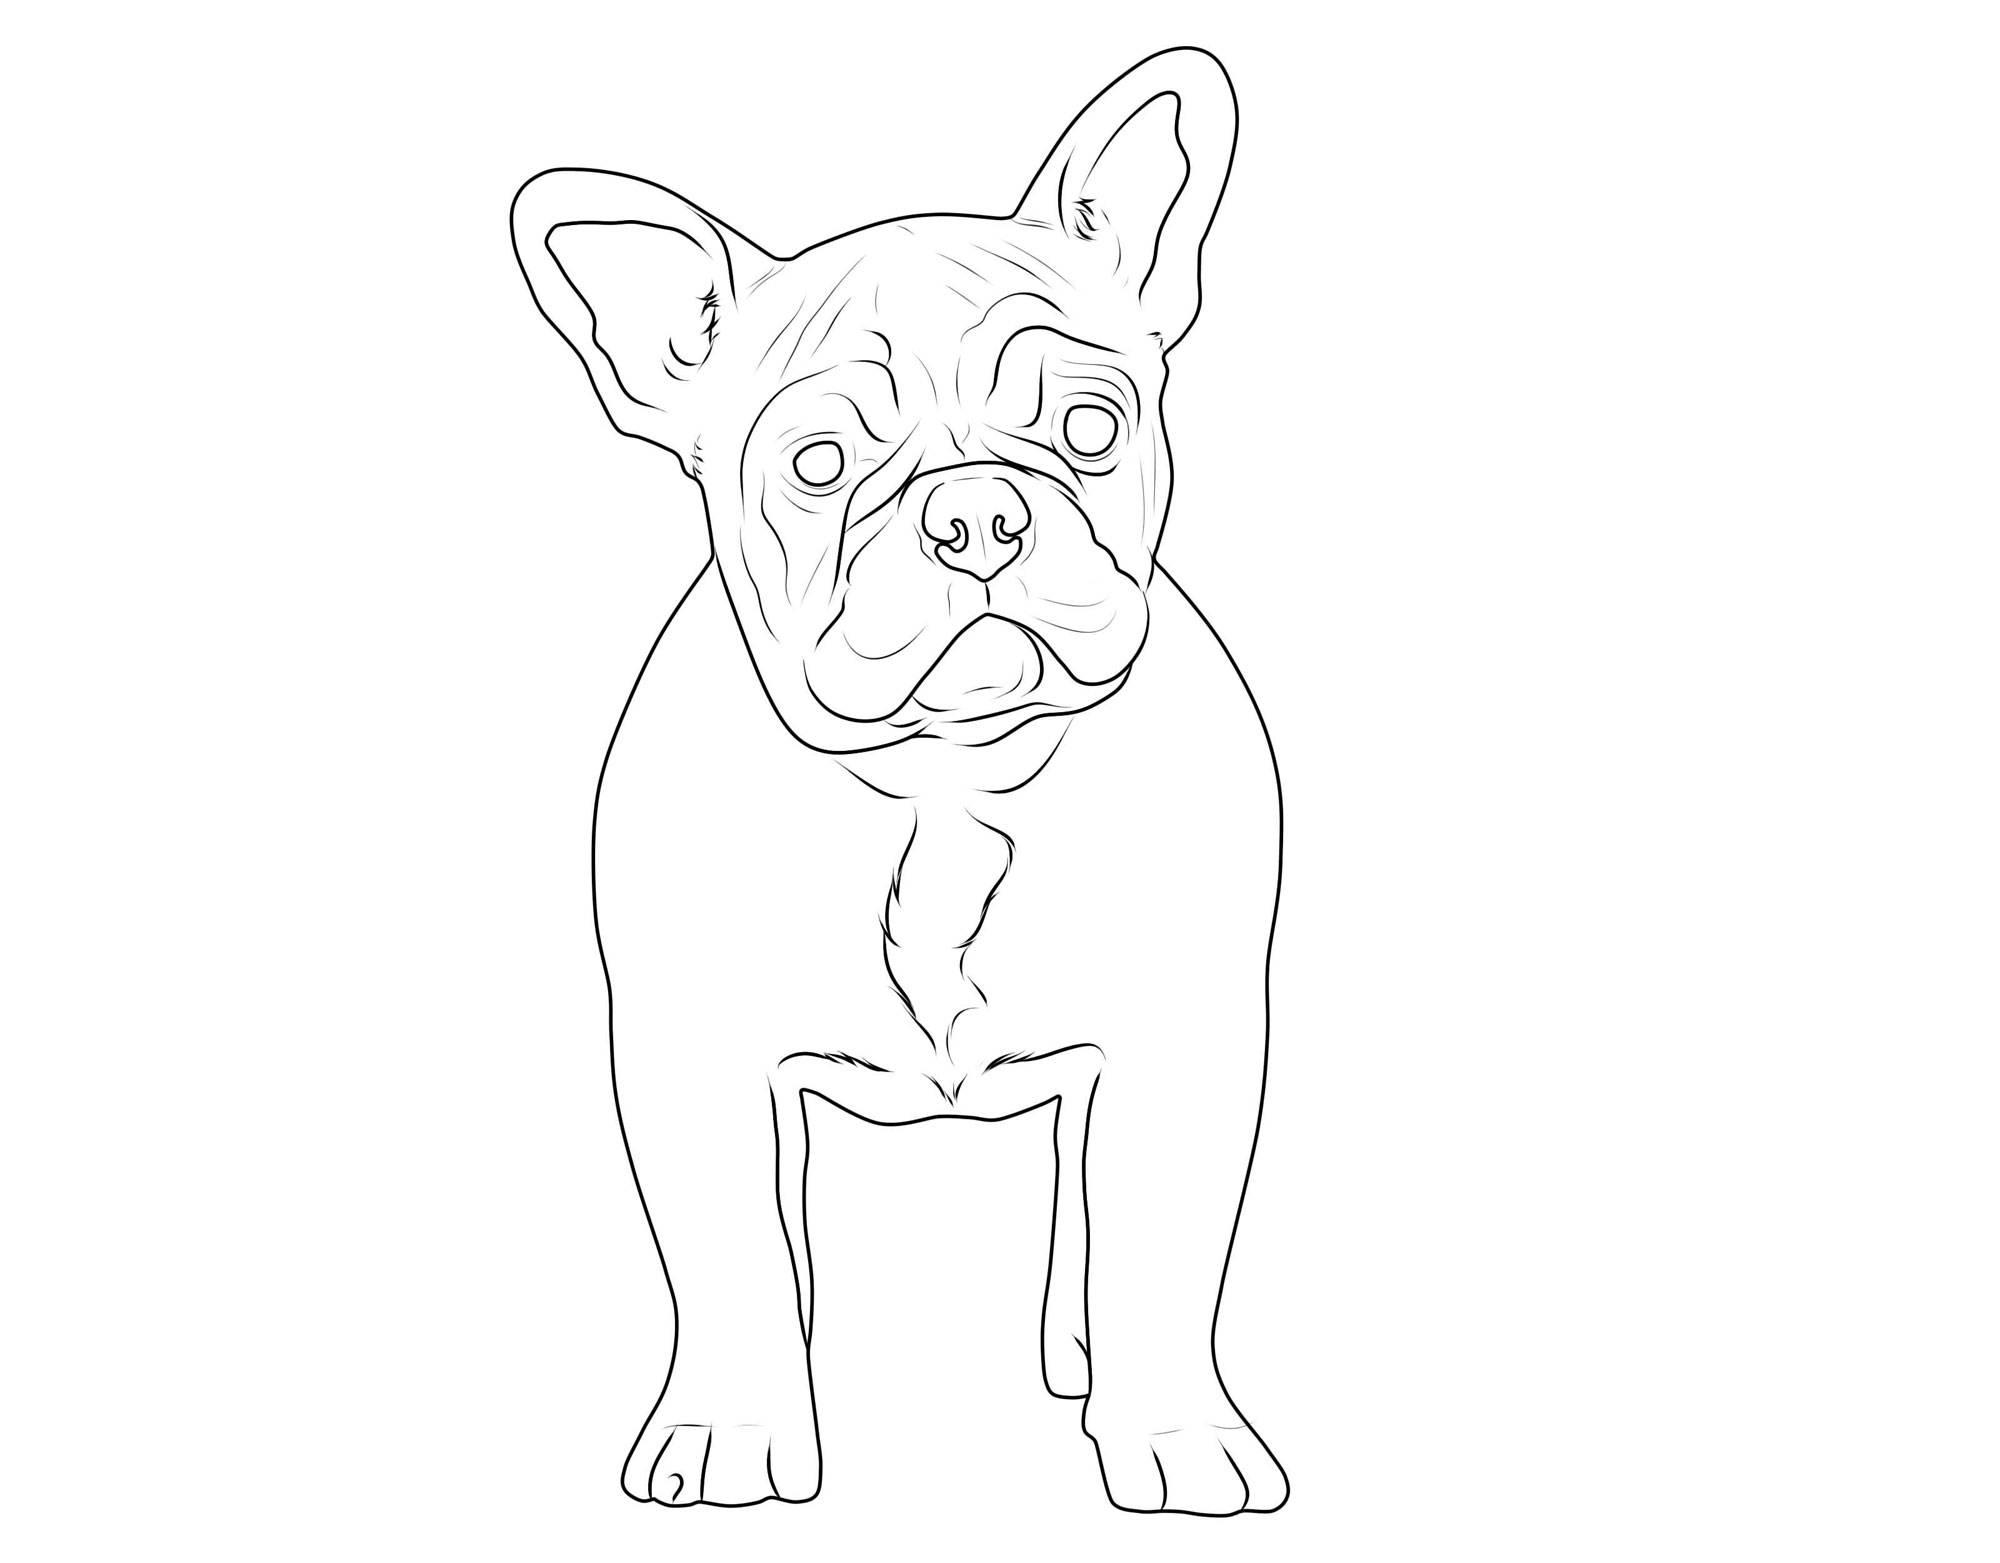 gratis malvorlage französische bulldogge  Coloring and Malvorlagan